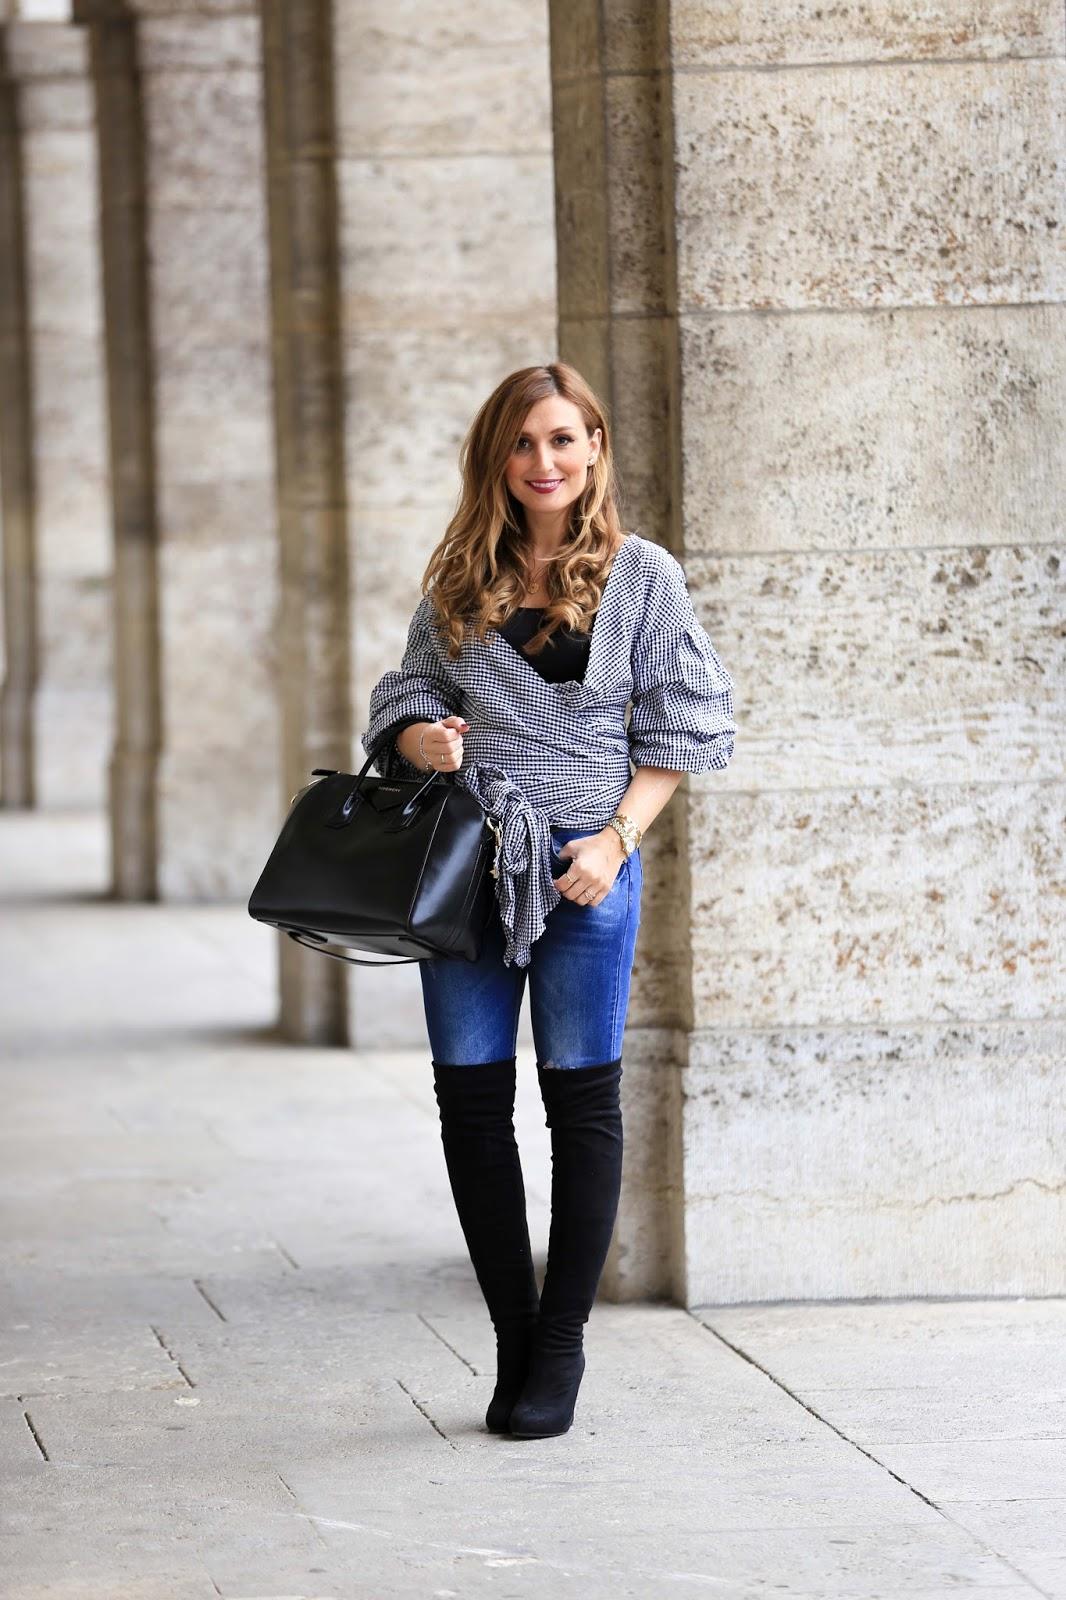 Givenchy Tasche -Fashionstylebyjohanna-fashionblog-frankfurt blogger-fashionblogger-bloggerdeutschland-lifestyleblog-modeblog-frankfurt-germanblogger-styleblog-bundfaltenhose-a-la-streetwear-chic